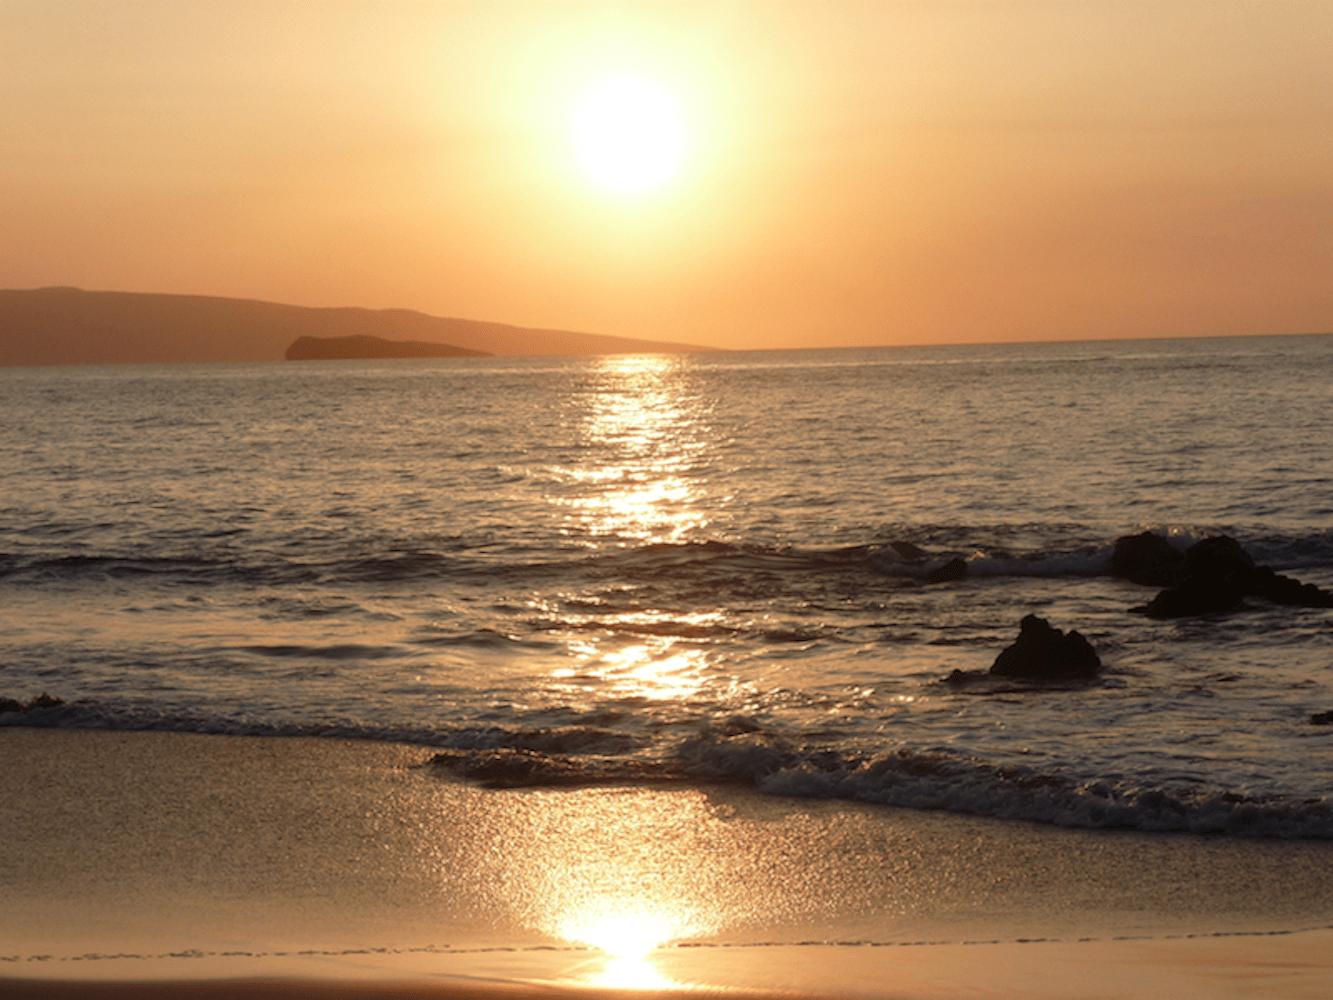 Hawaii Sunset Times - AlohaFunWeddings.com | title | sunset times